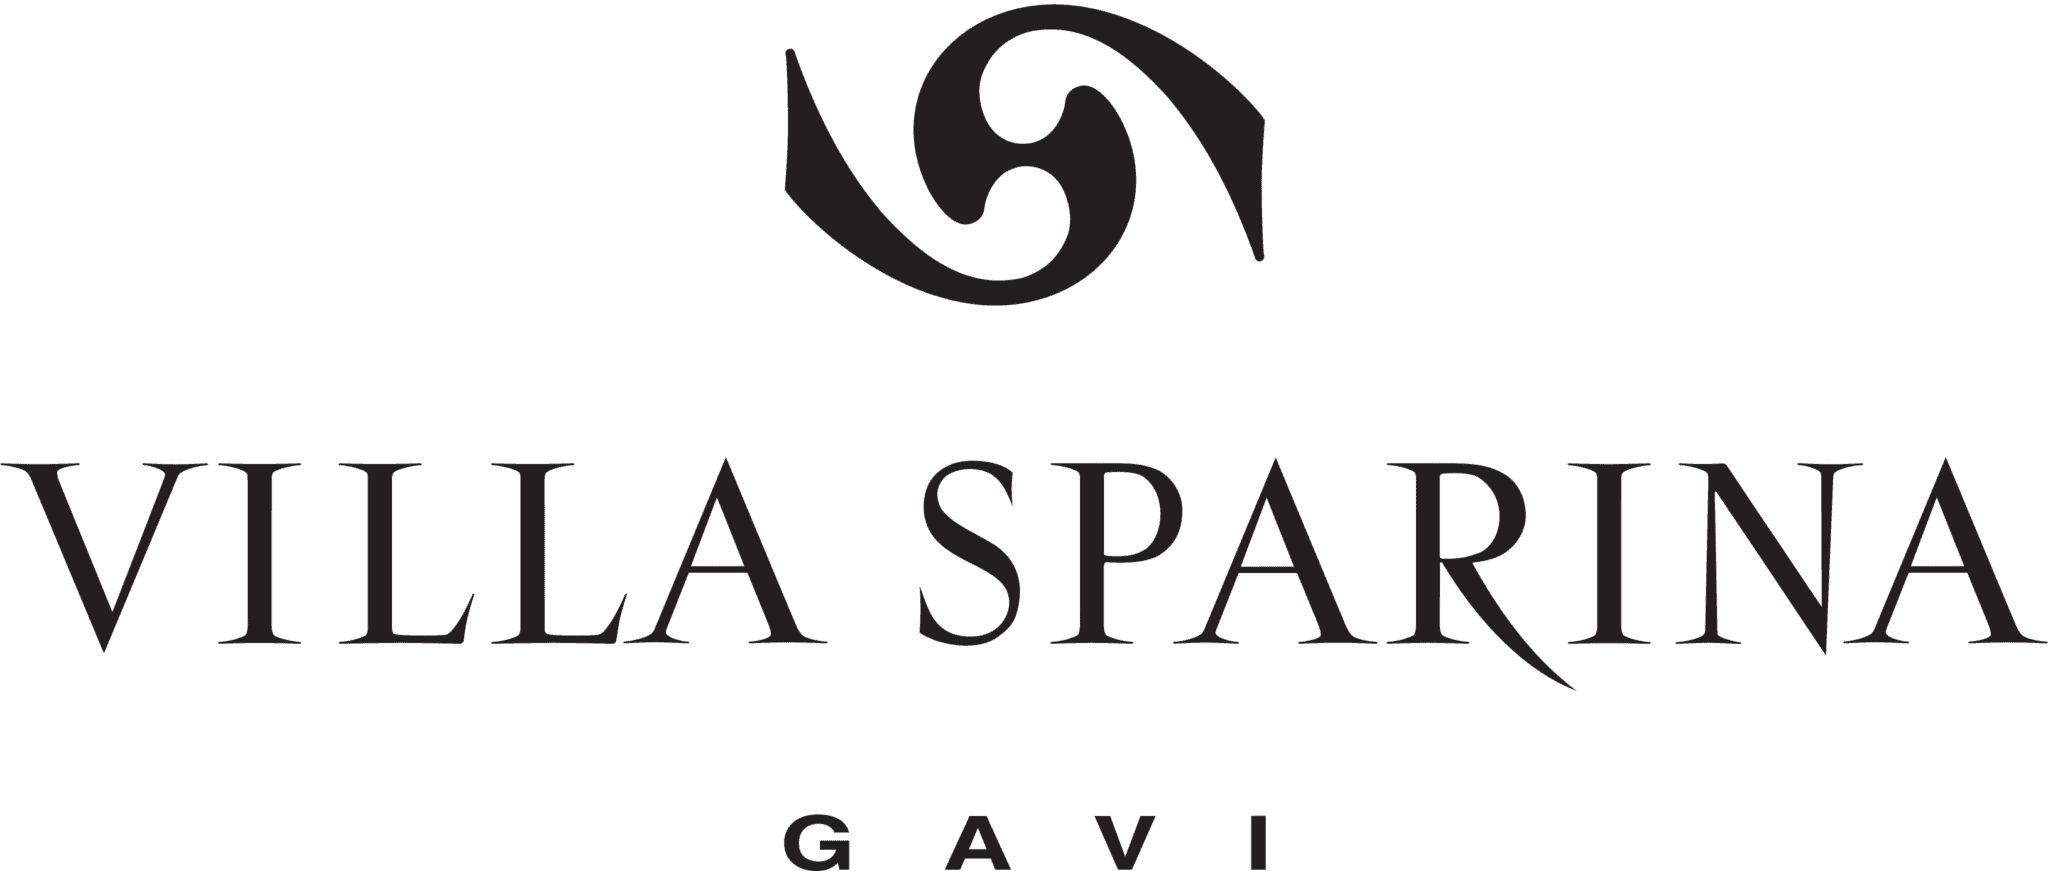 Villa Sparing logo PNG